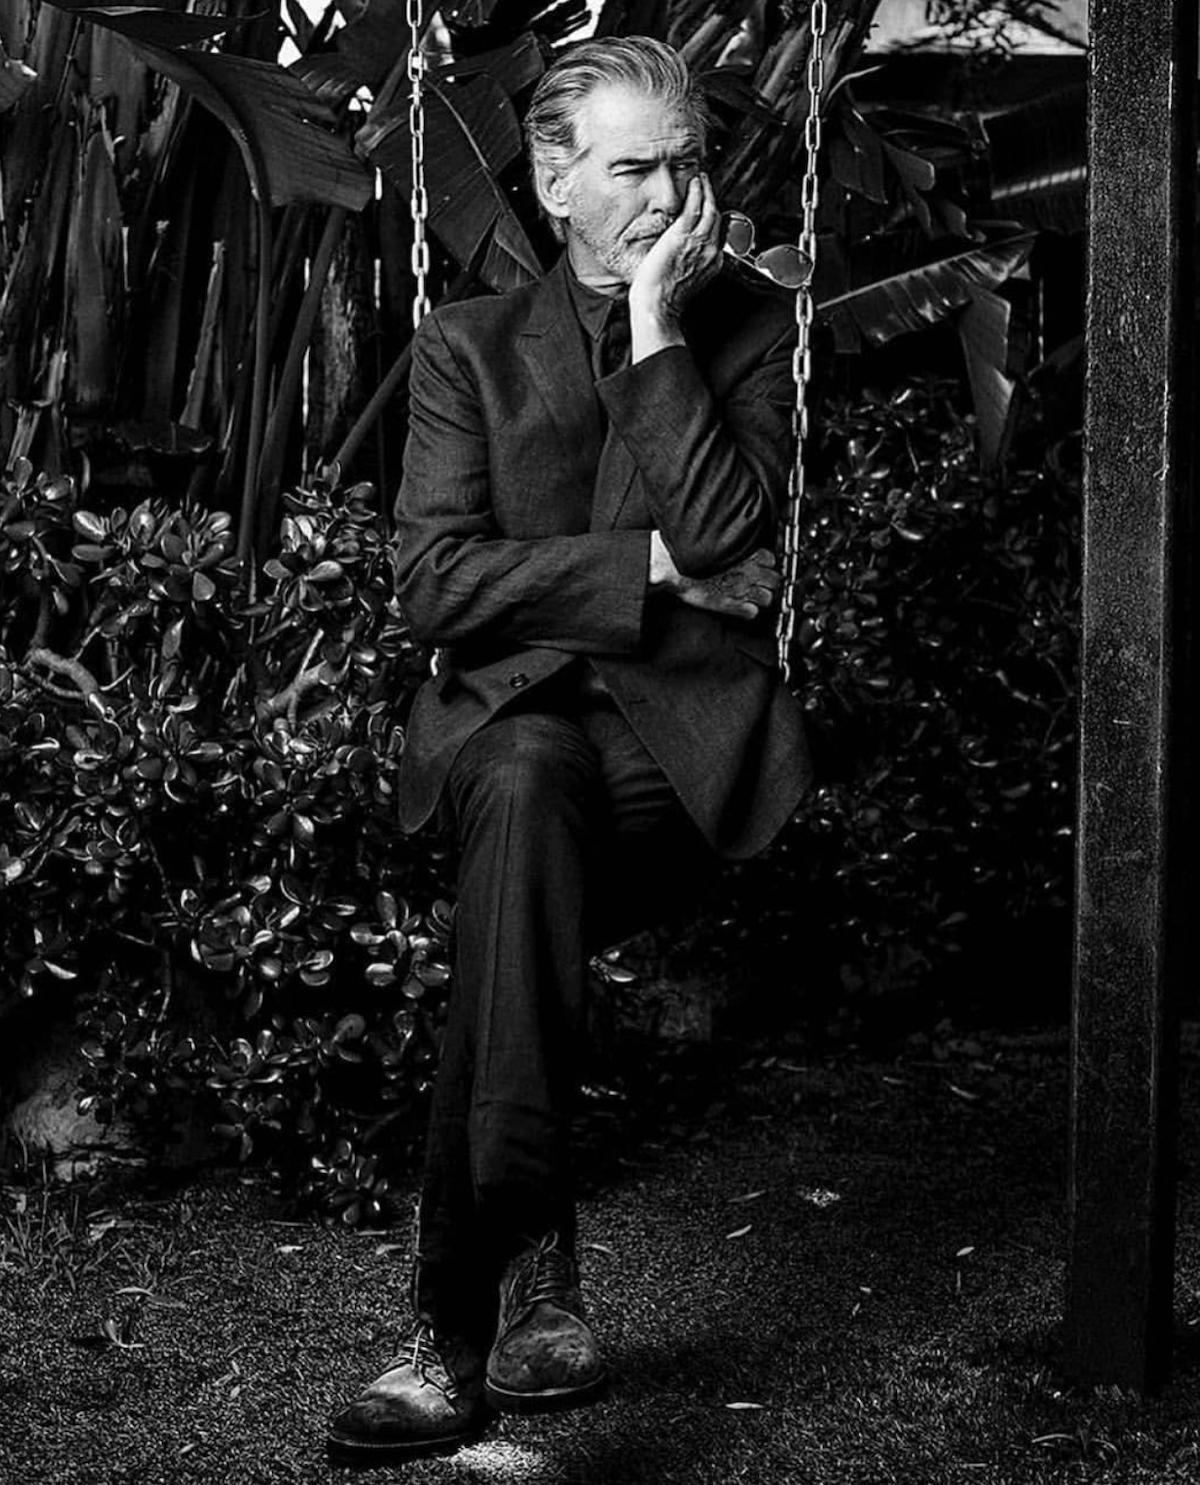 Pierce Brosnan looking stylish at age 66